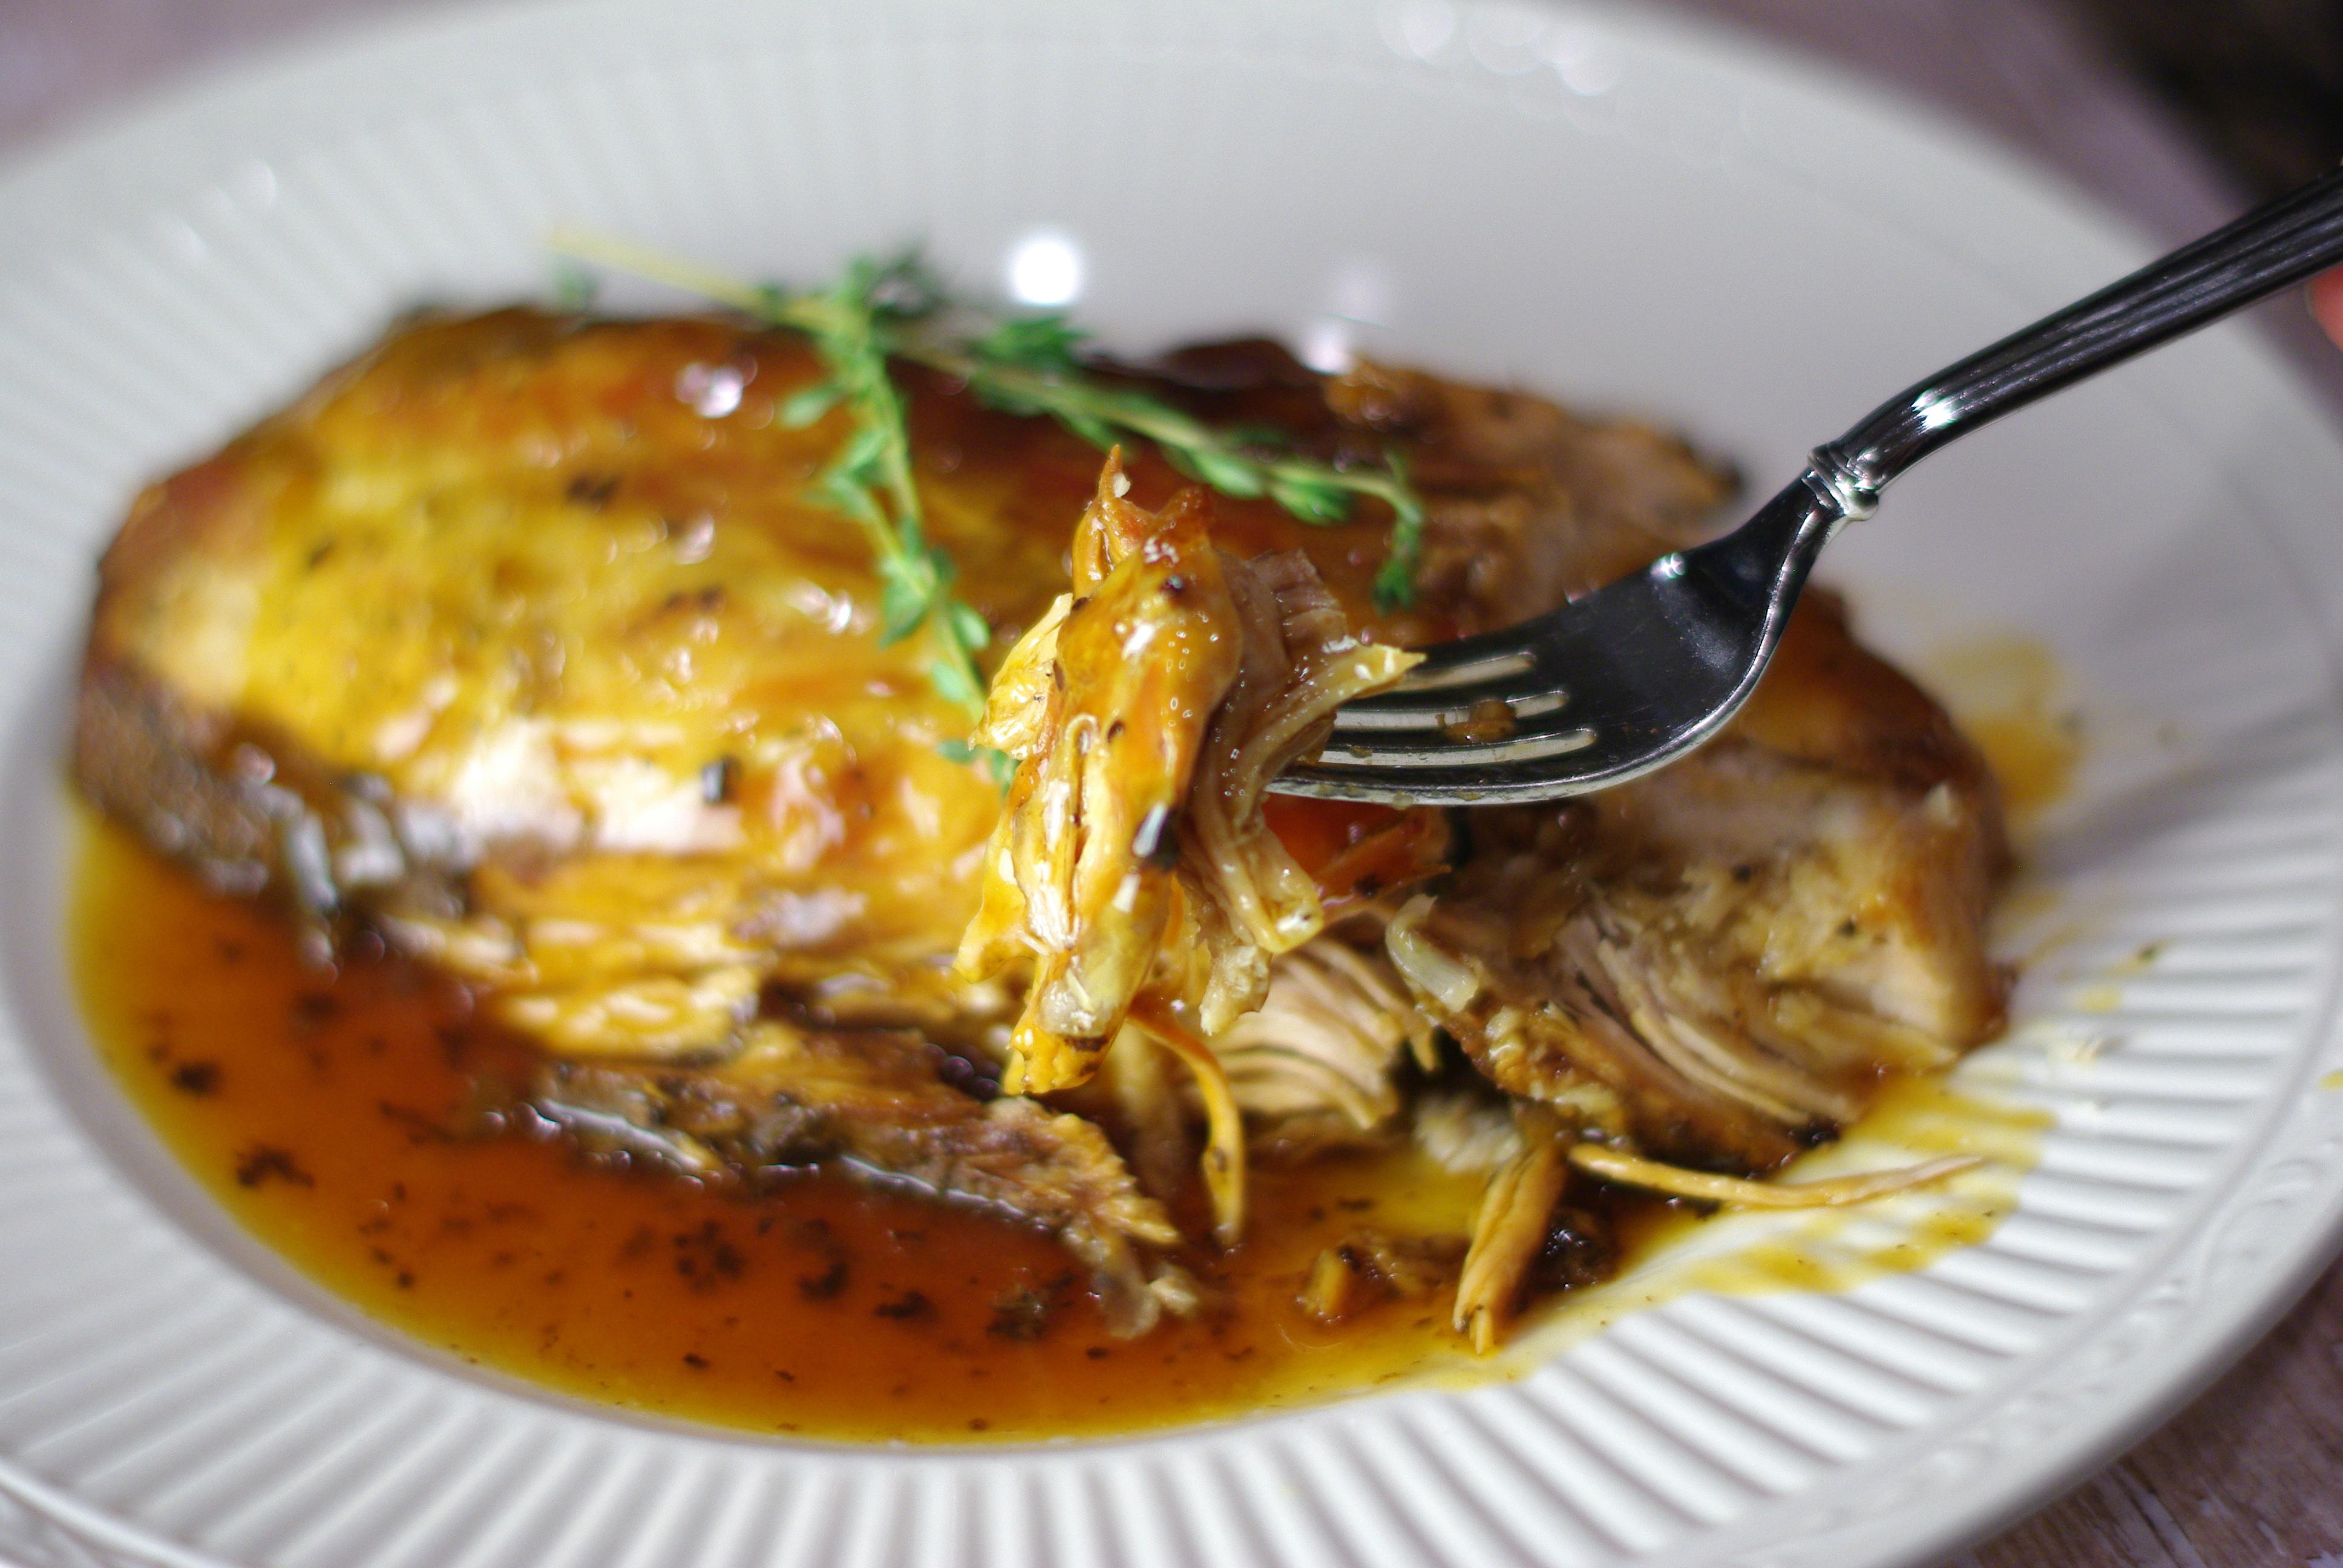 Roasted Pork Loin with a Honey Balsamic Wine Sauce